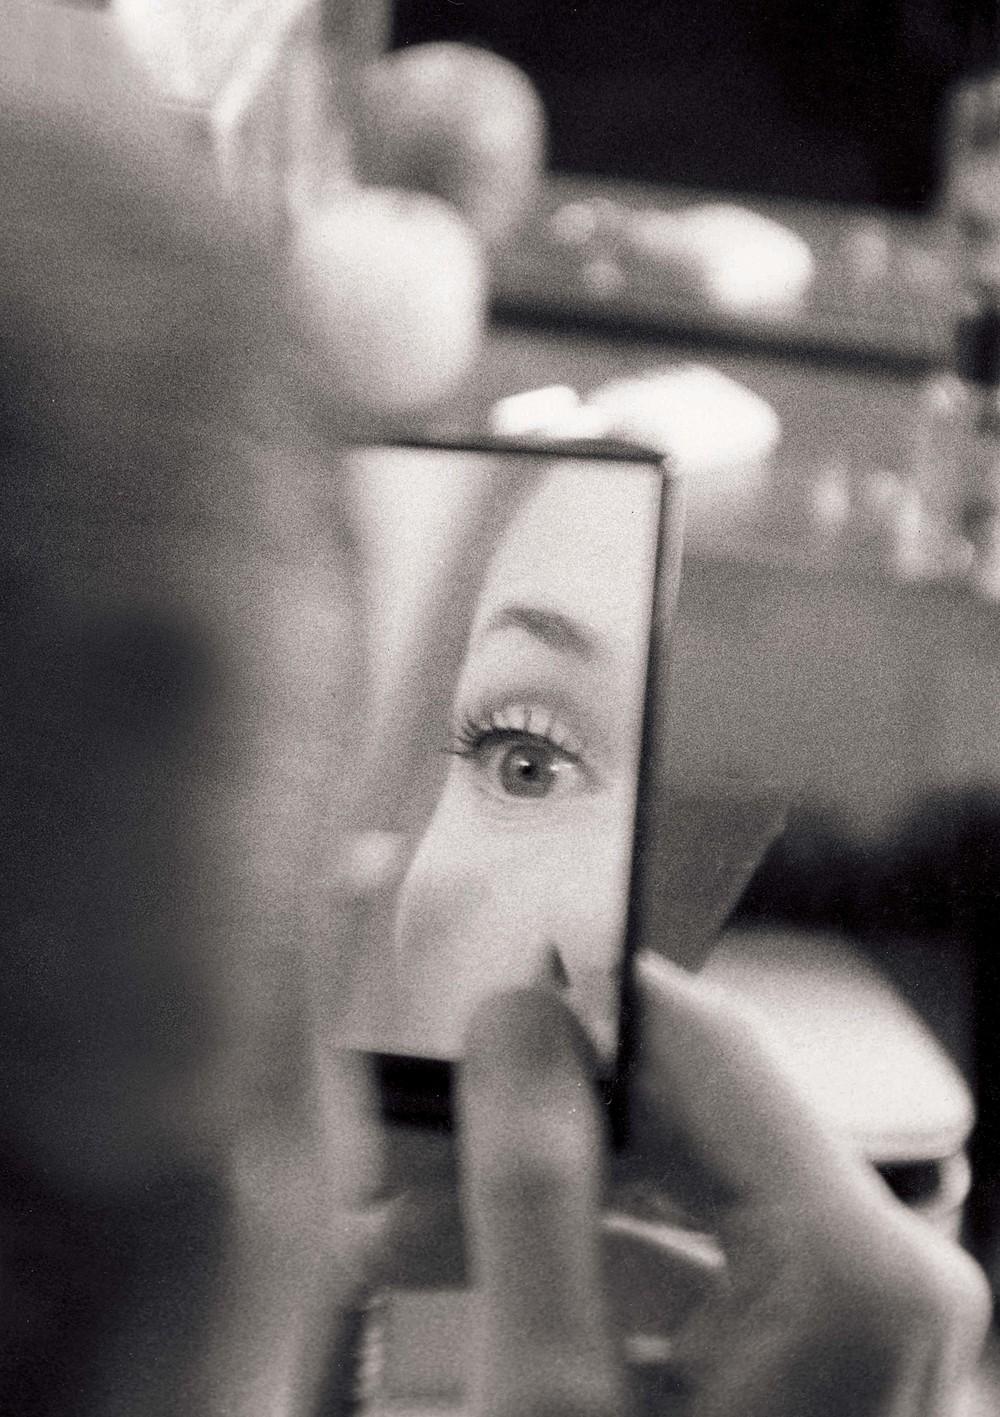 Darcey's Eye